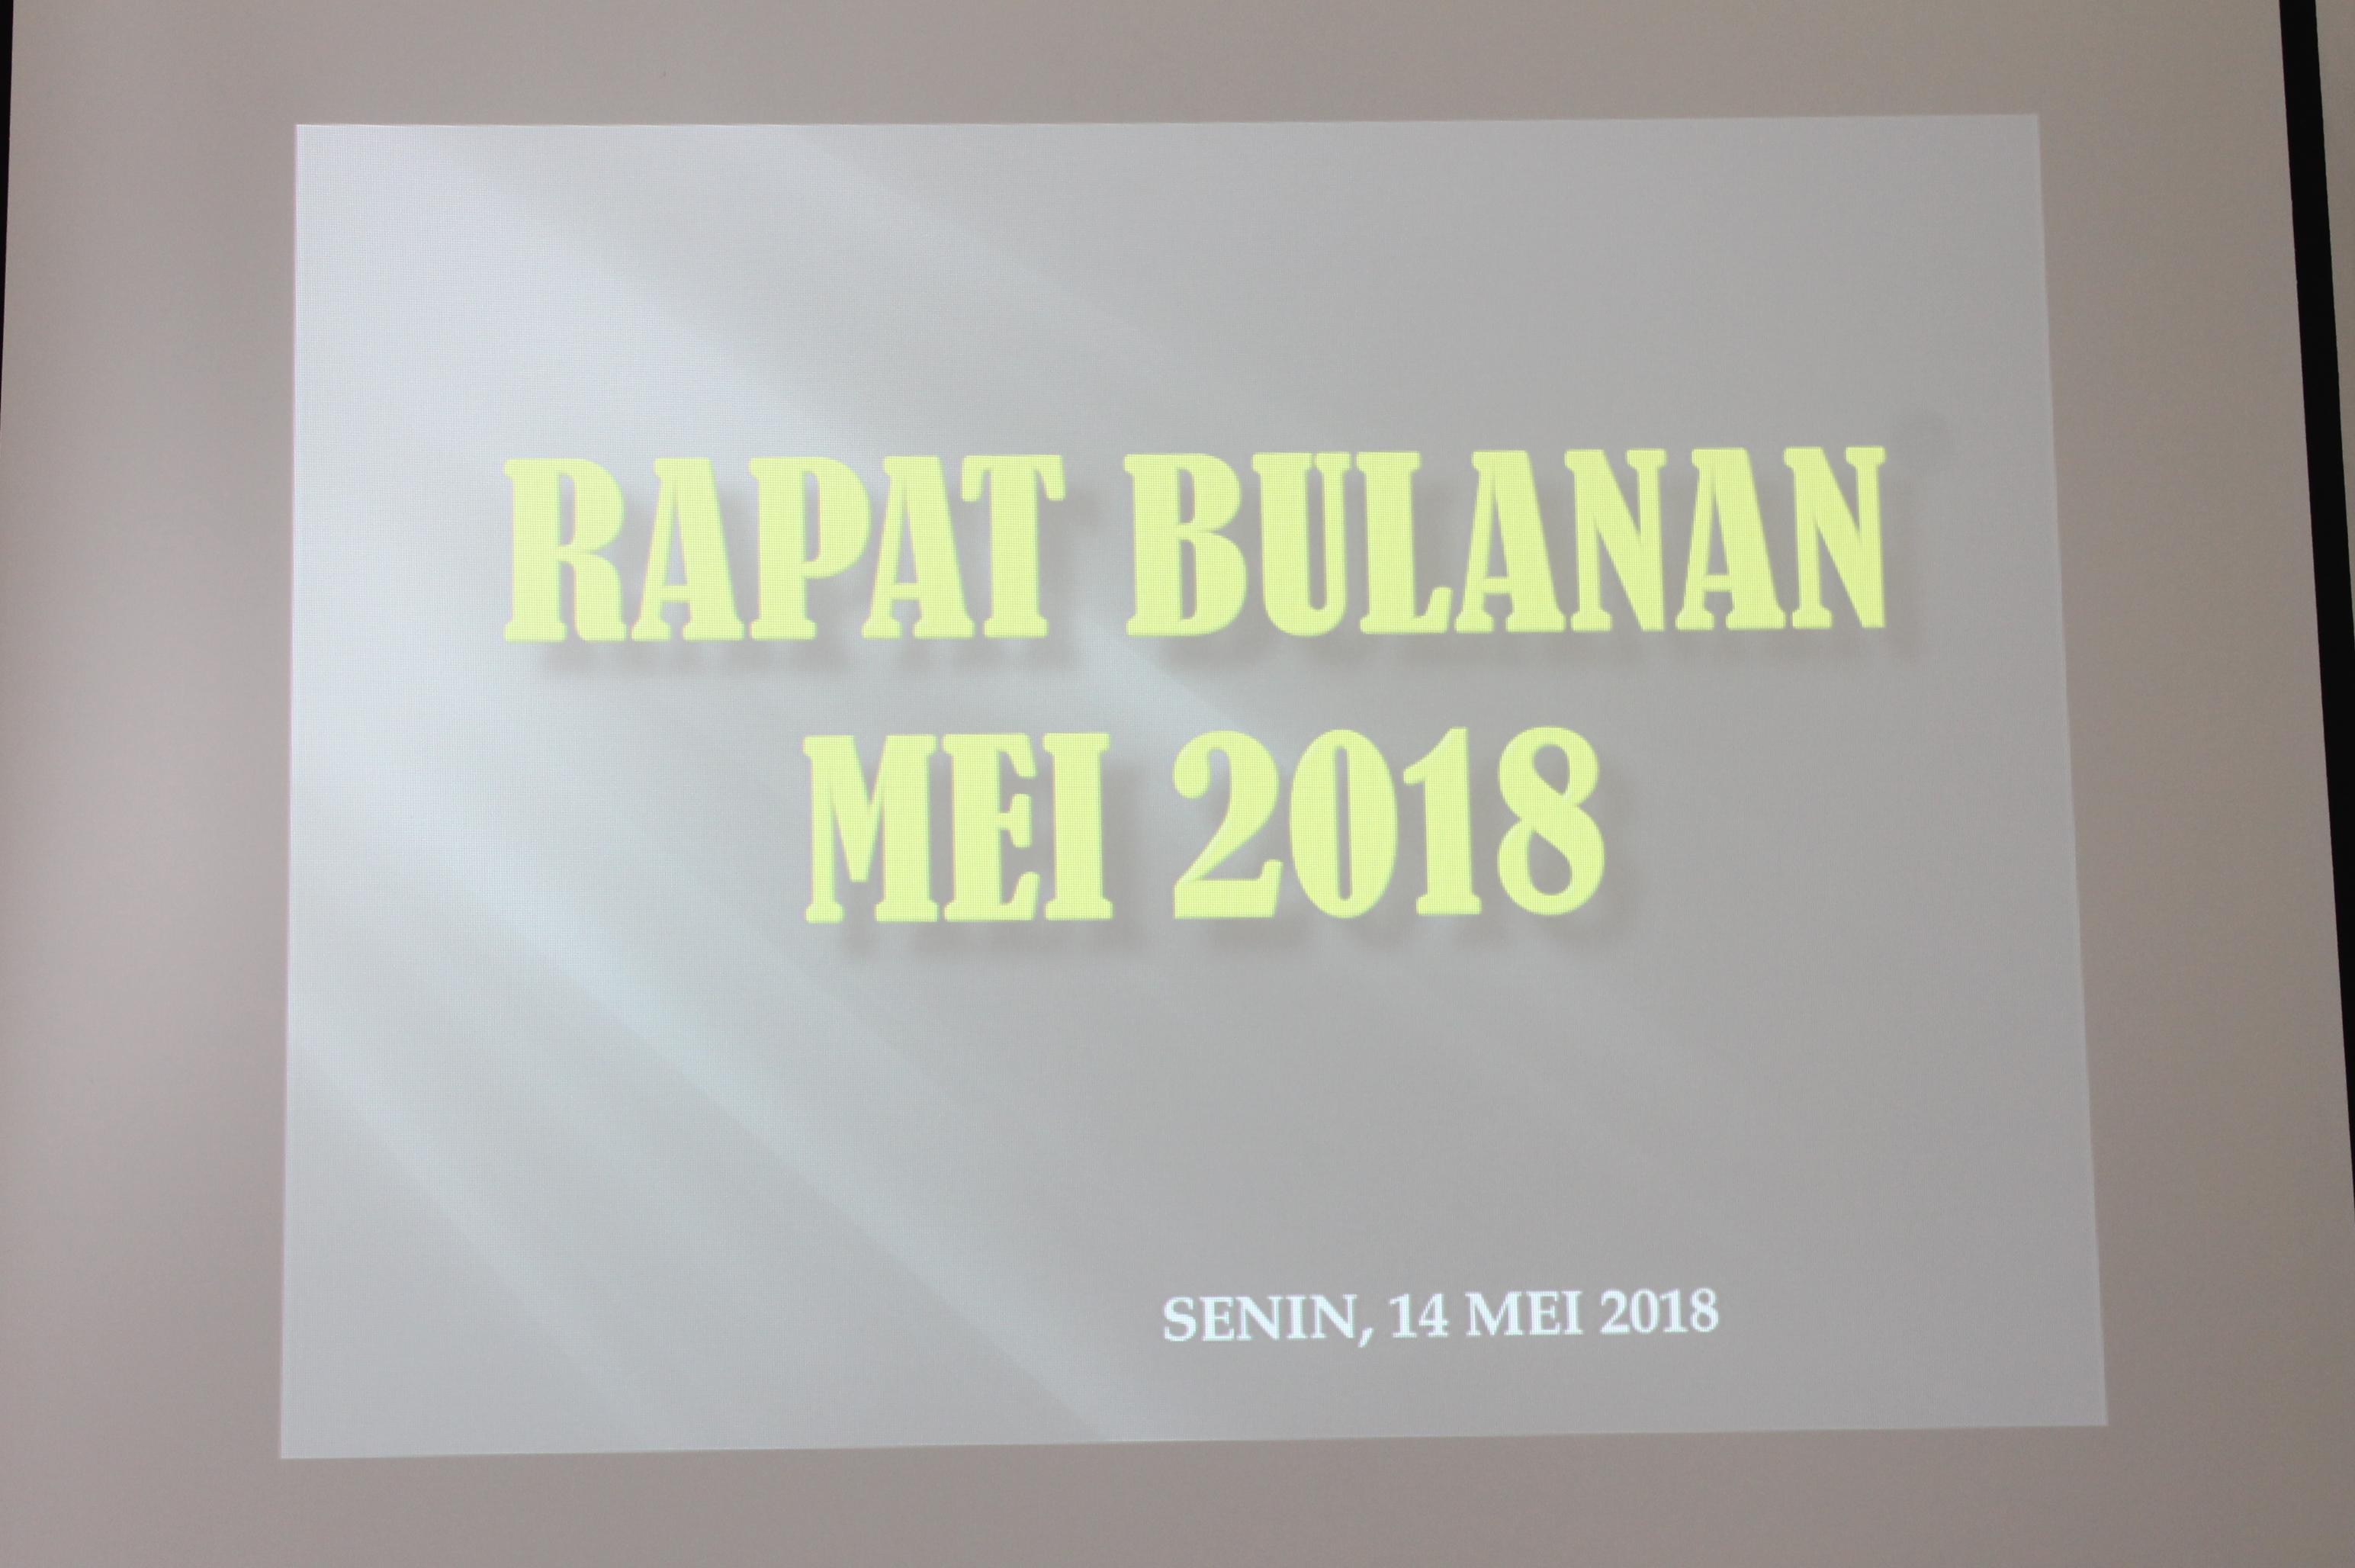 Rapat Bulanan periode Mei 2018, Sosialisasi Budaya 5R dan 3S, Sosialisasi PERMA Nomor 3 tahun 2018 dan PERMA Nomor 4 TAHUN 2017